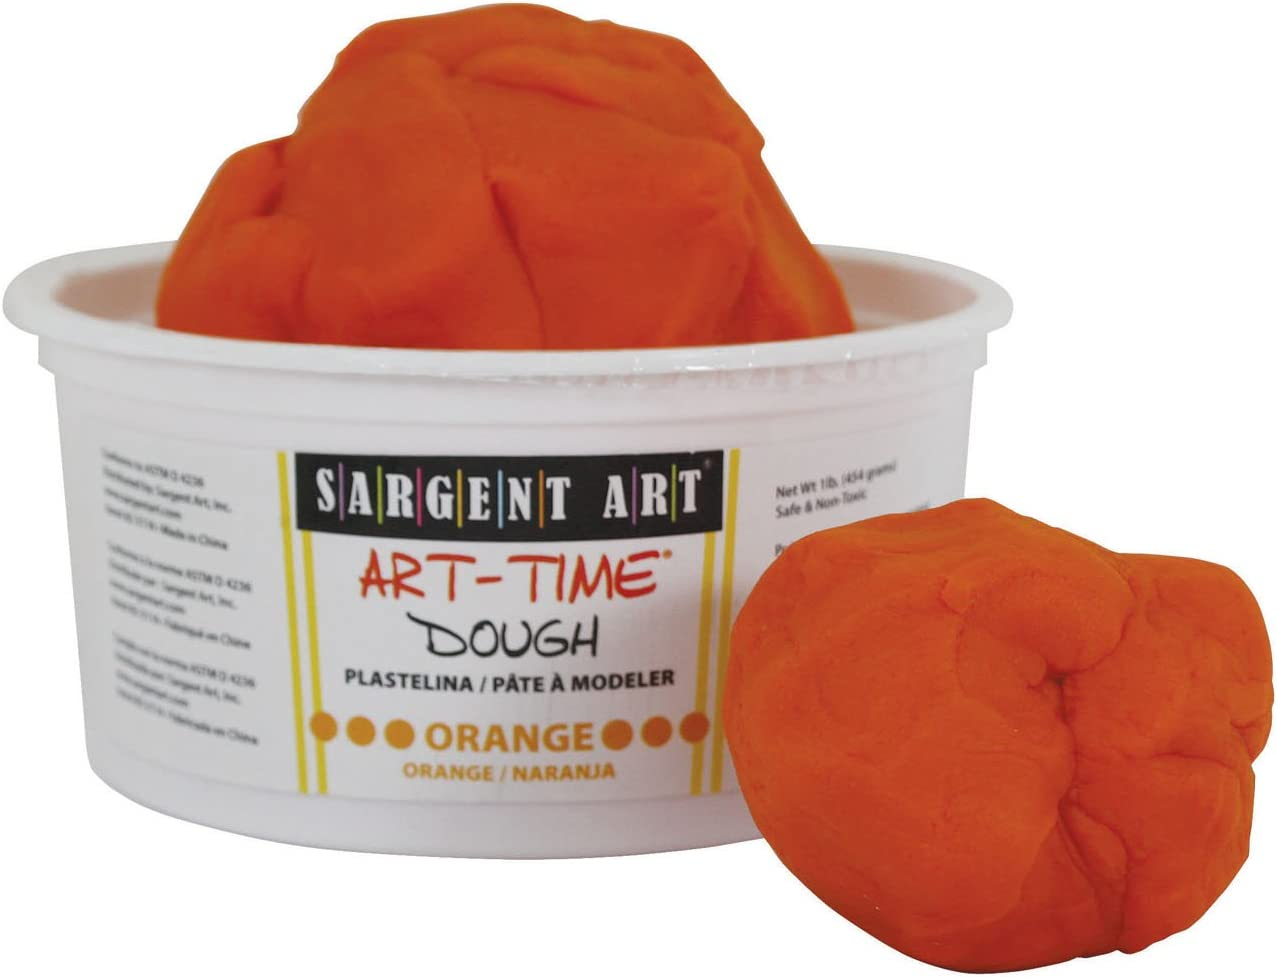 Sargent Art 85-3320 3-Pound Art-Time Dough Red